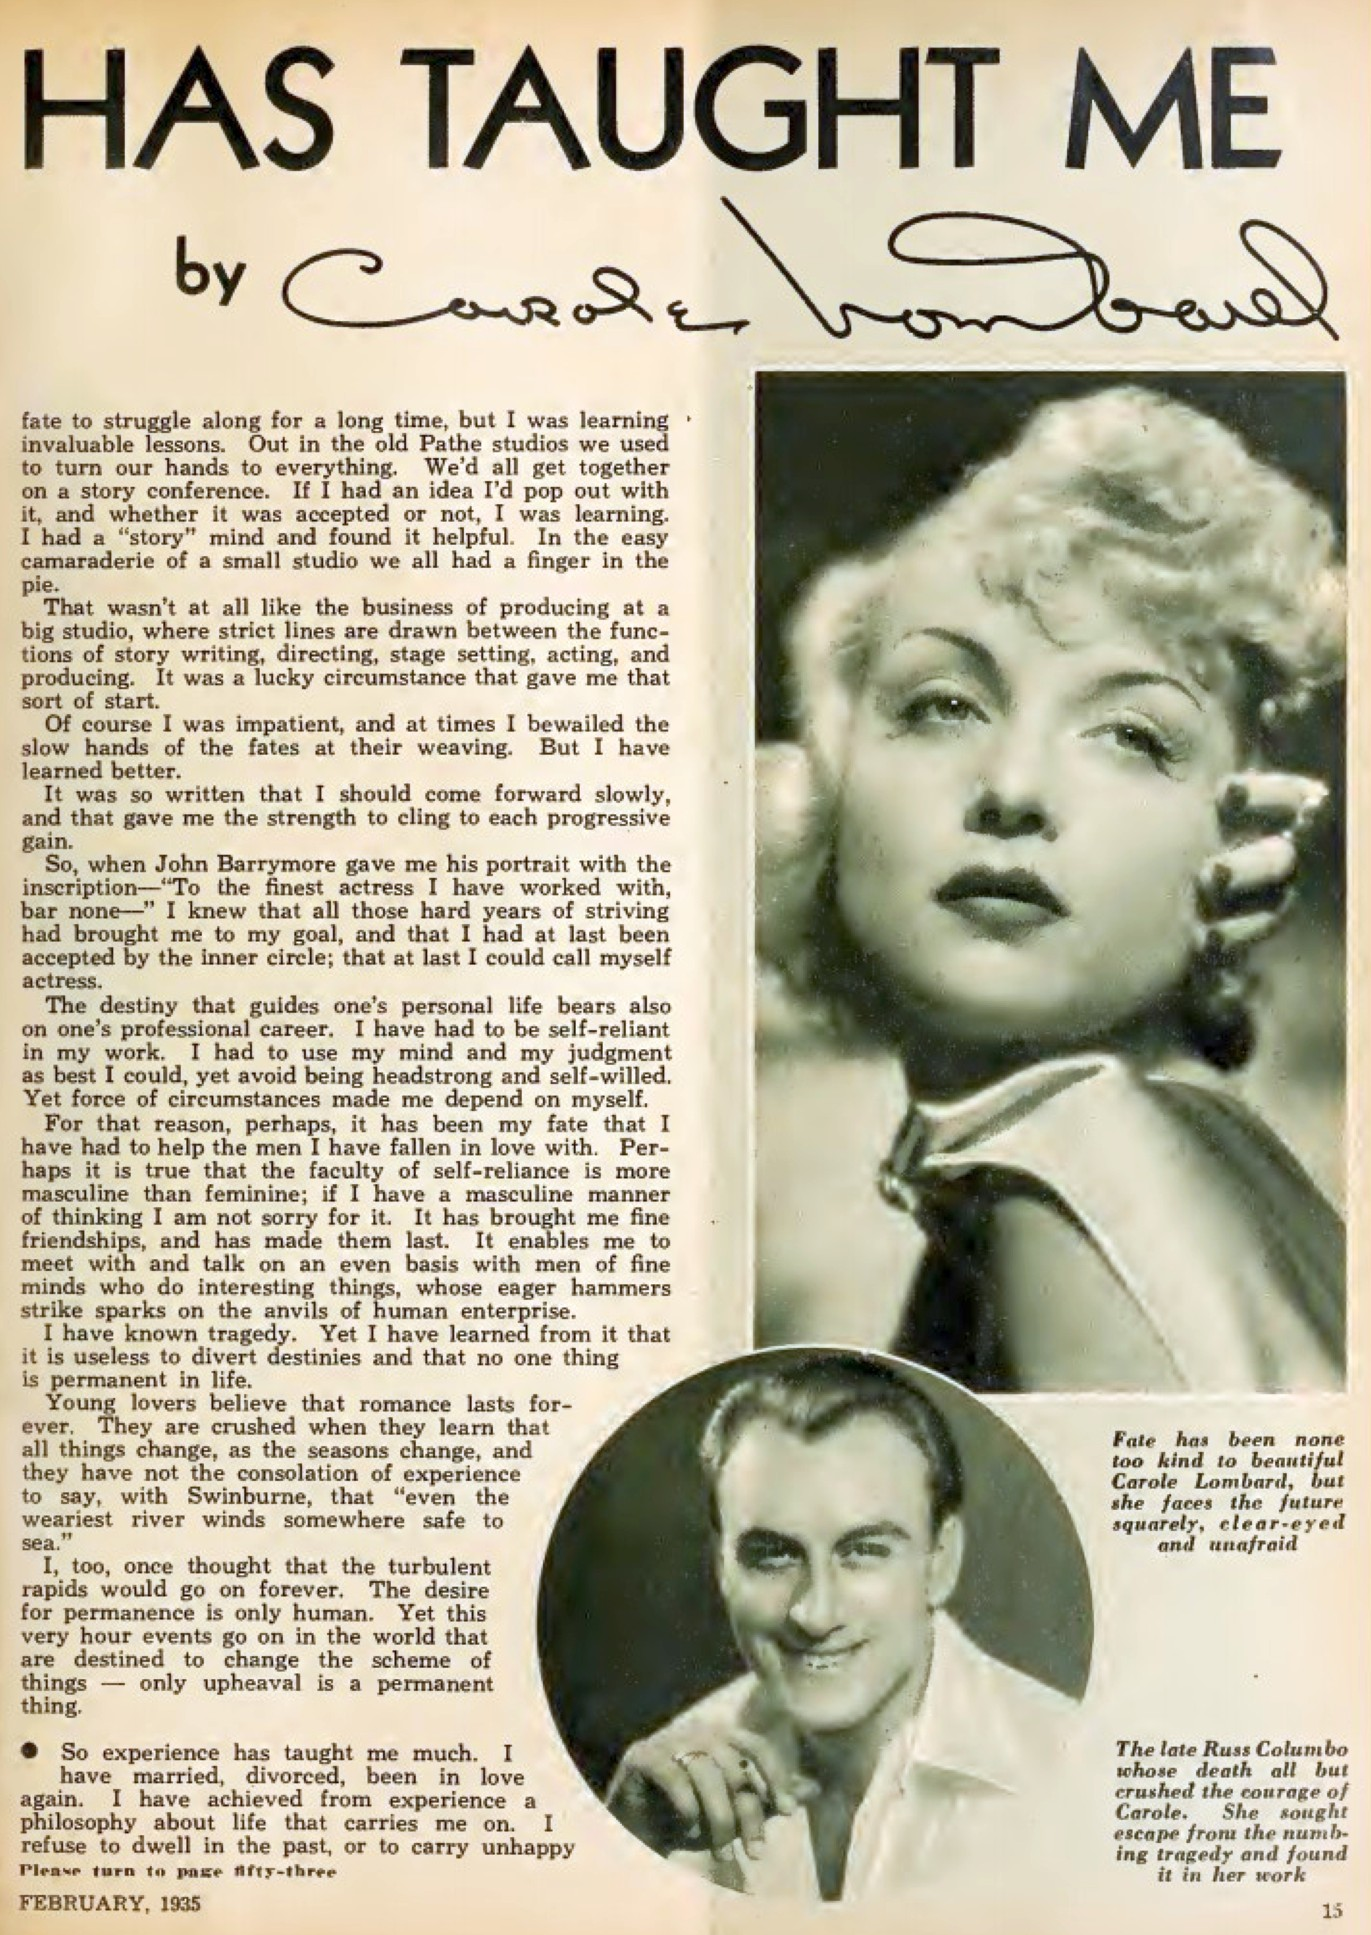 carole lombard hollywood february 1935b